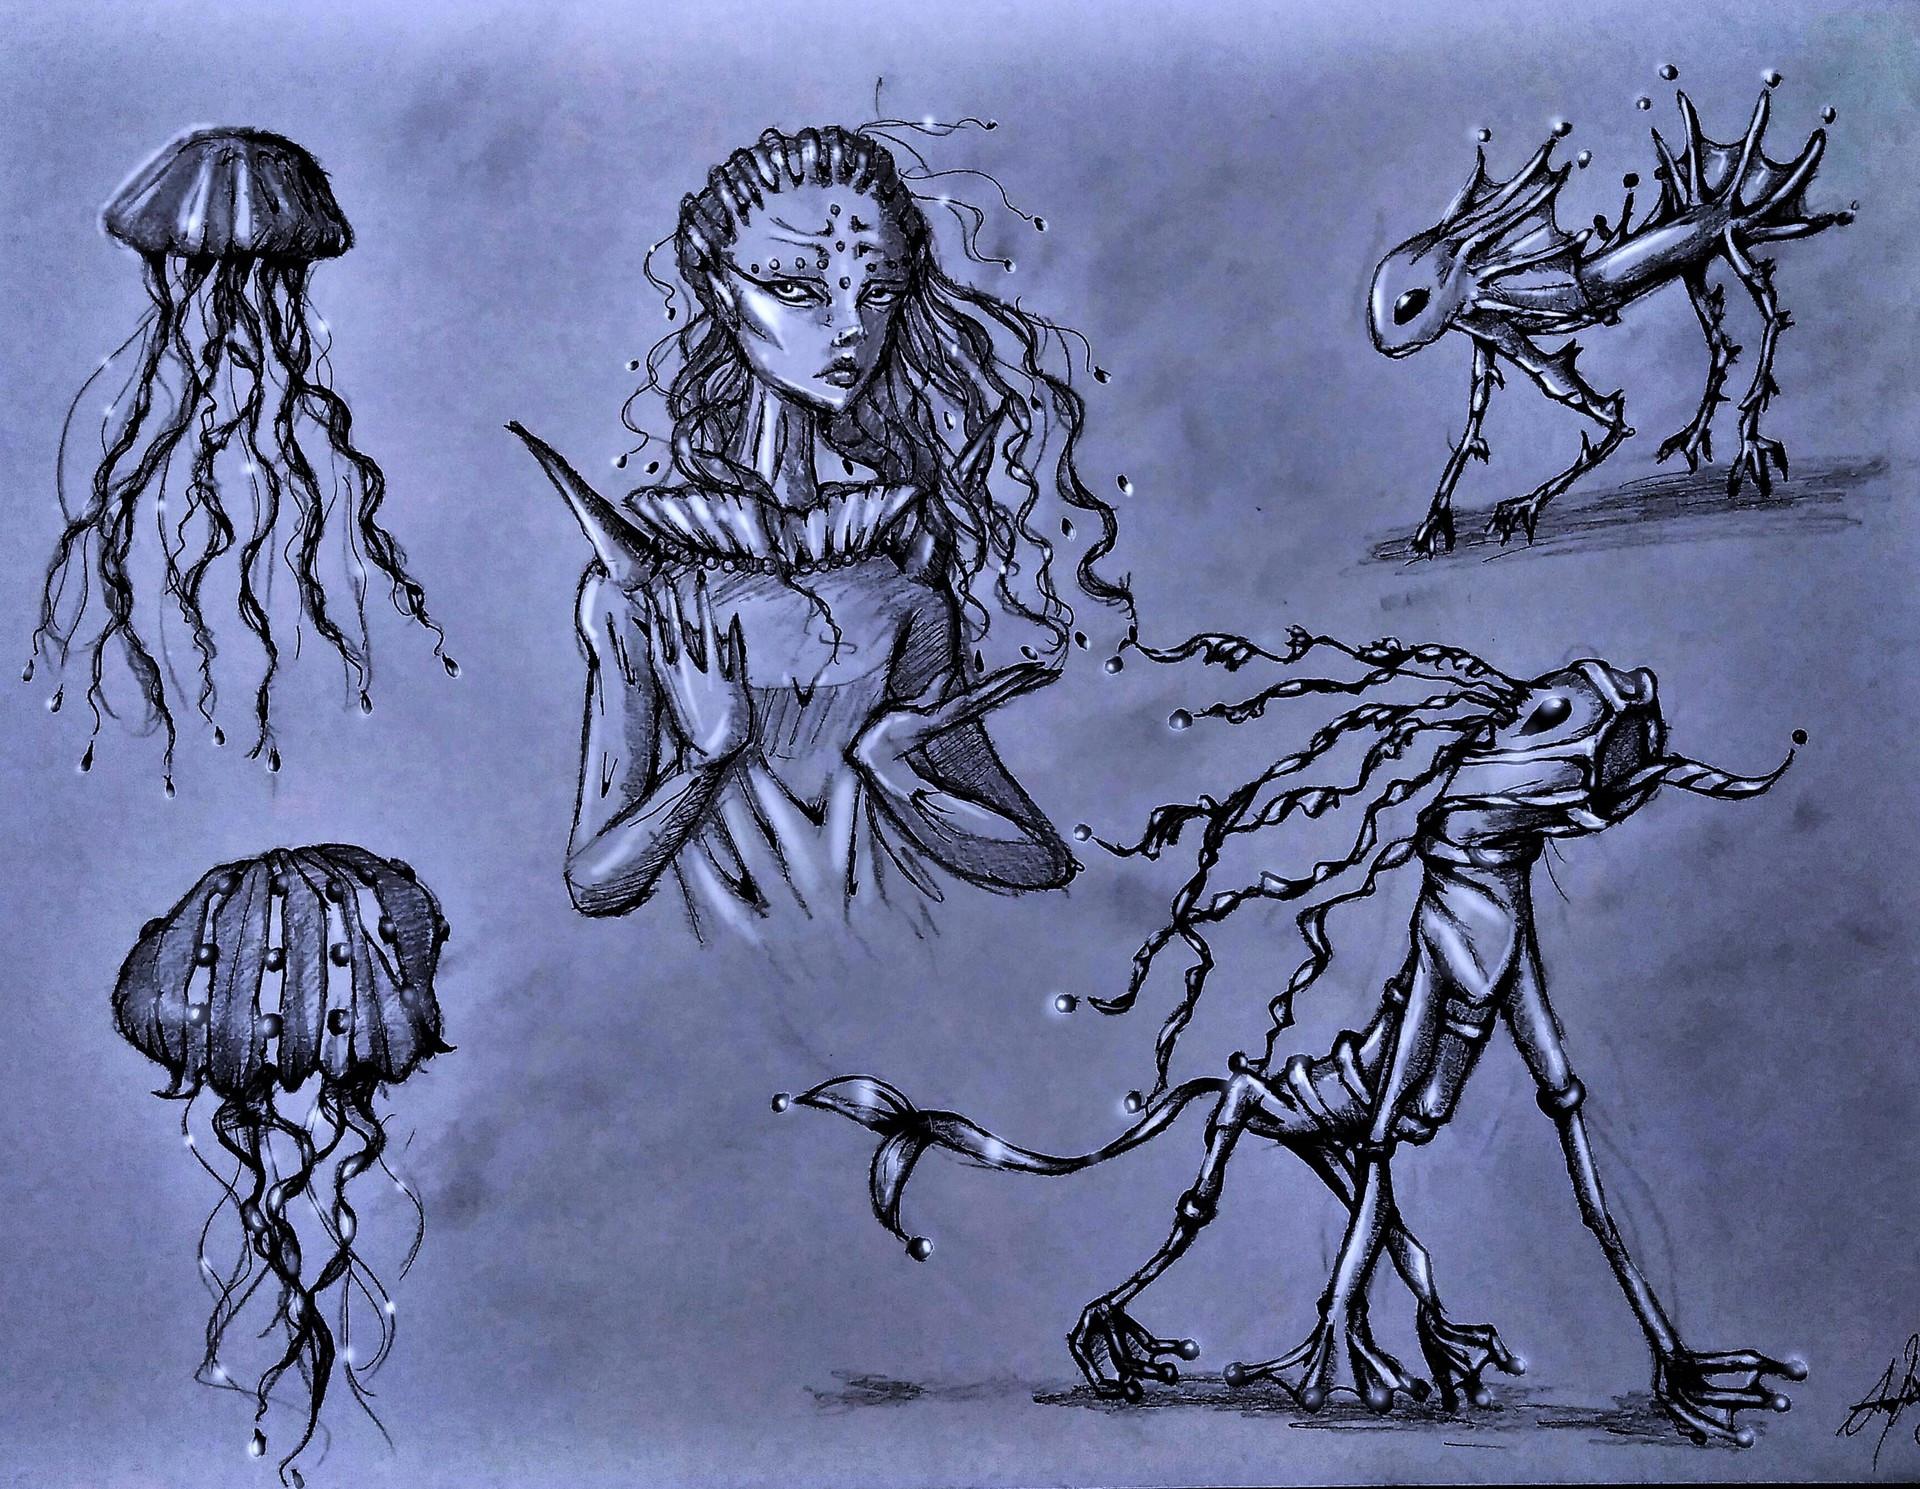 Sea creatures-Character Design/Illustration, 2017